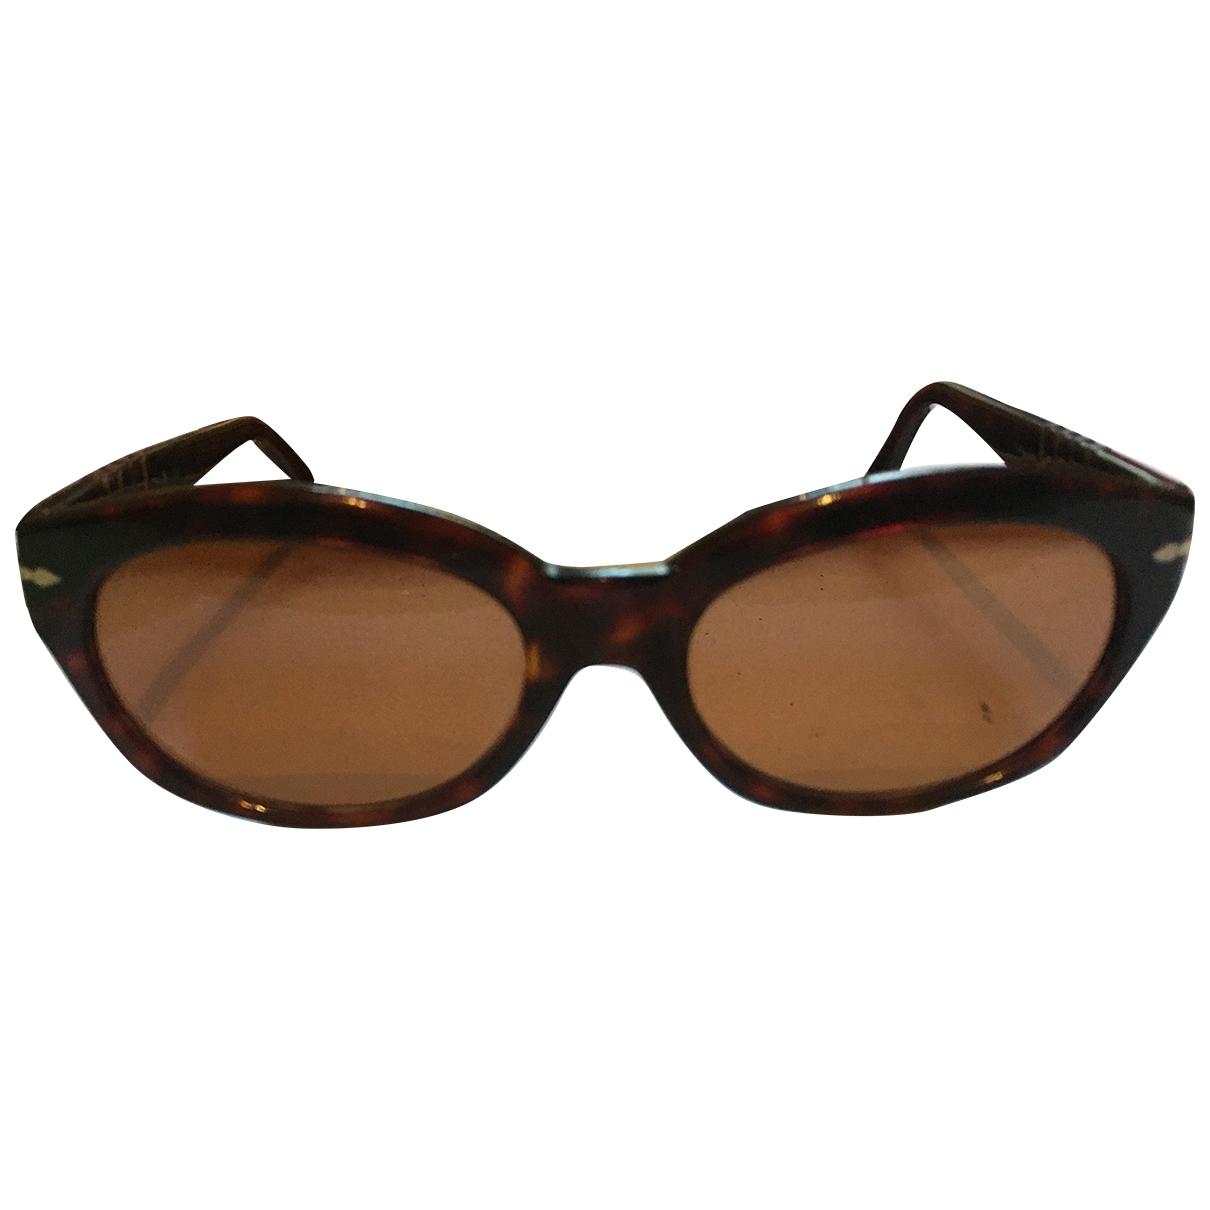 Persol \N Brown Sunglasses for Women \N